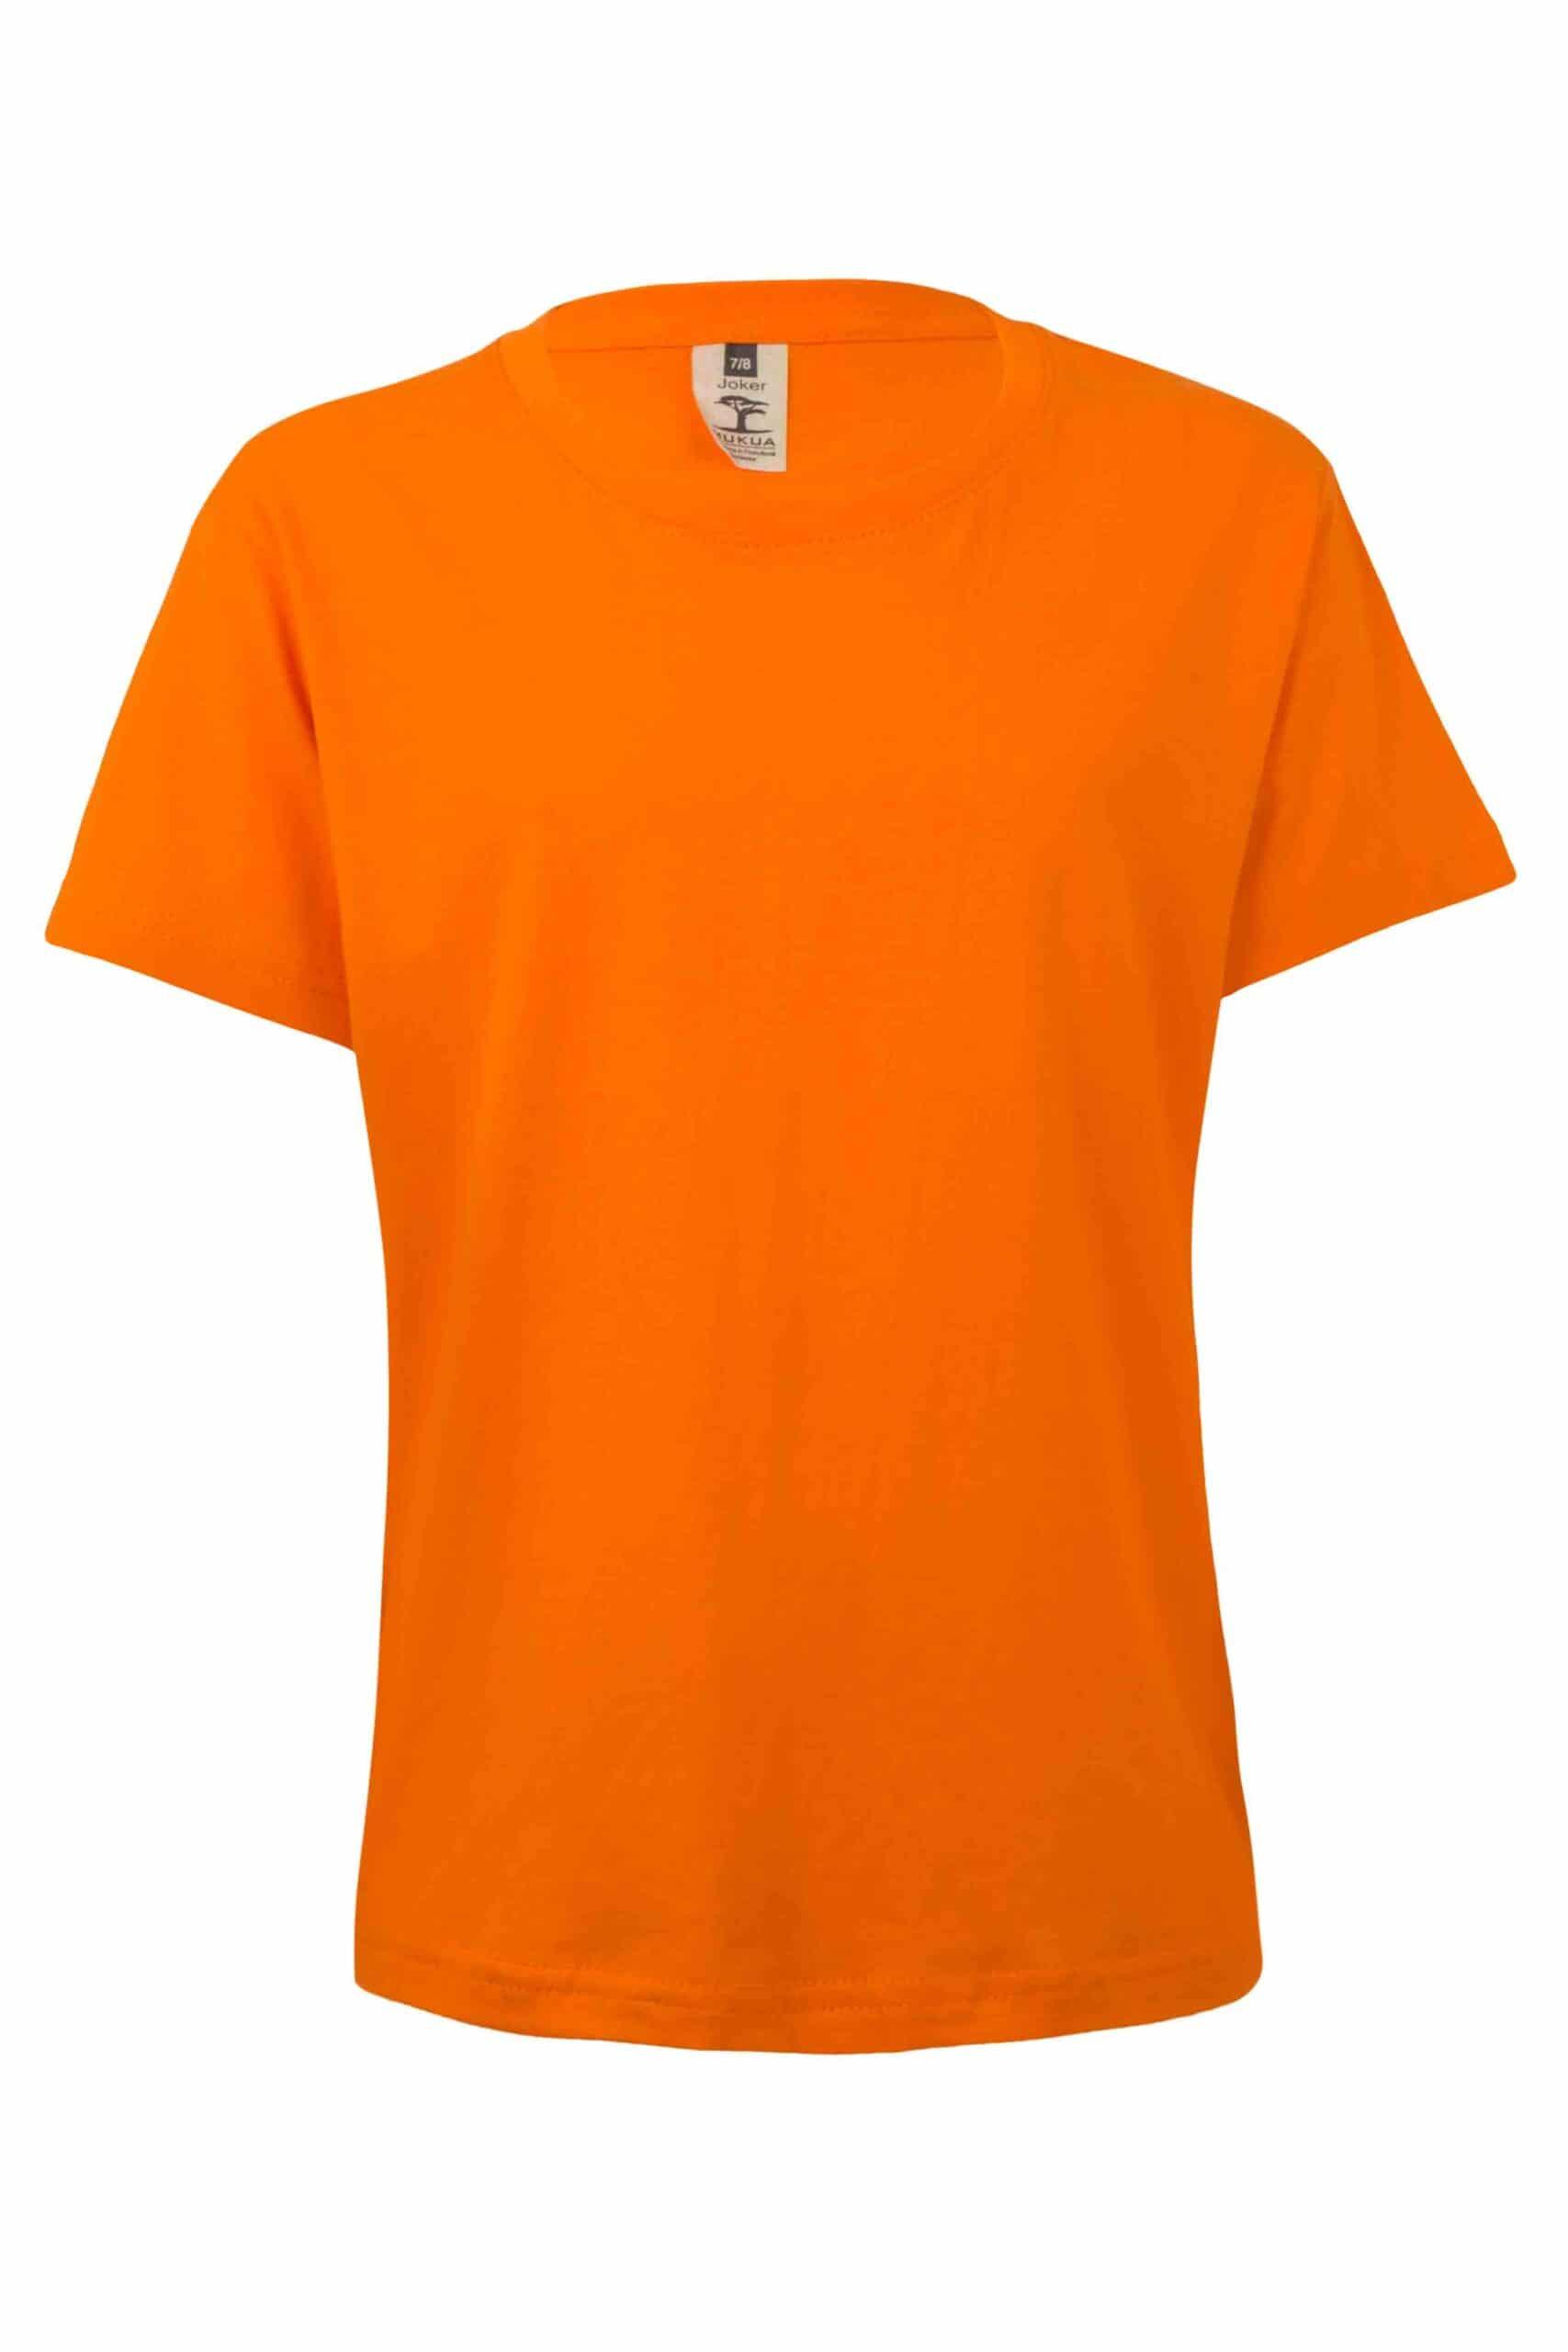 Mukua Mk175cv Camiseta Manga Corta NiÑo Orange